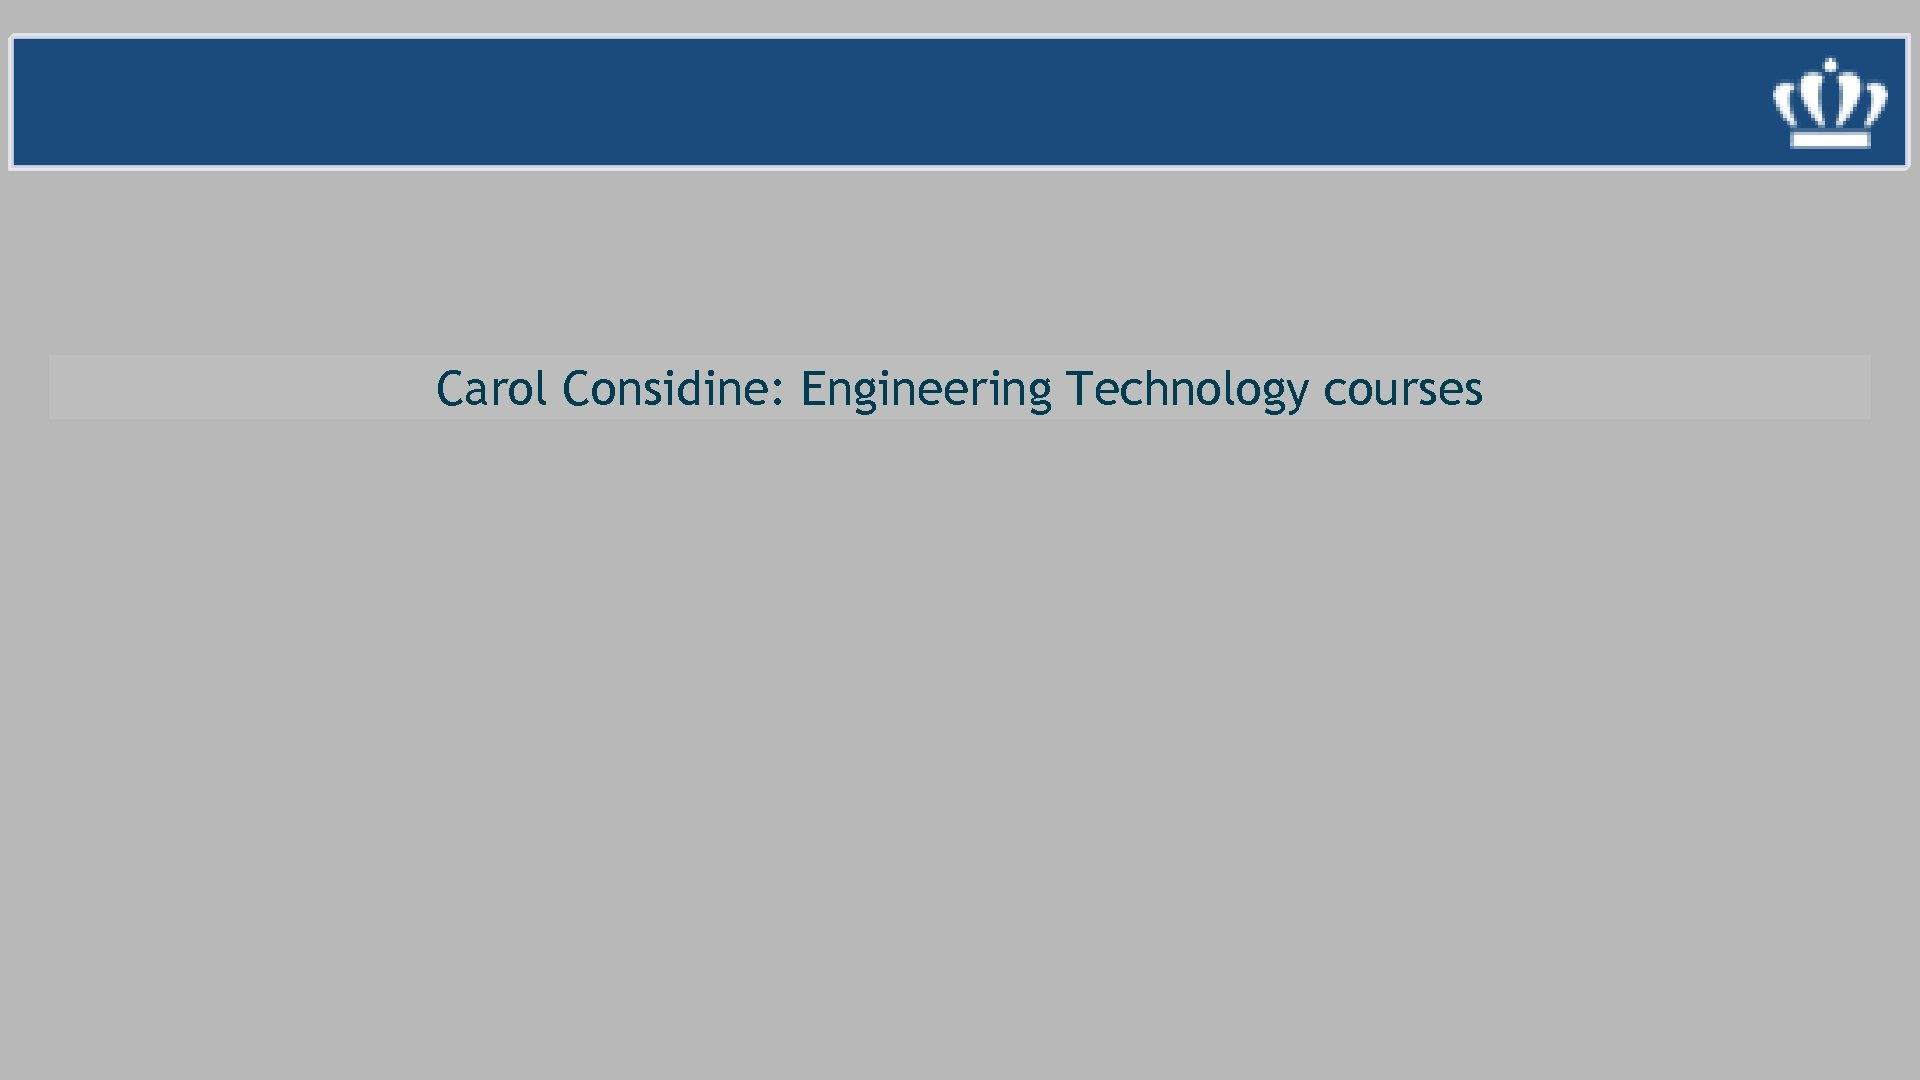 Carol Considine: Engineering Technology courses